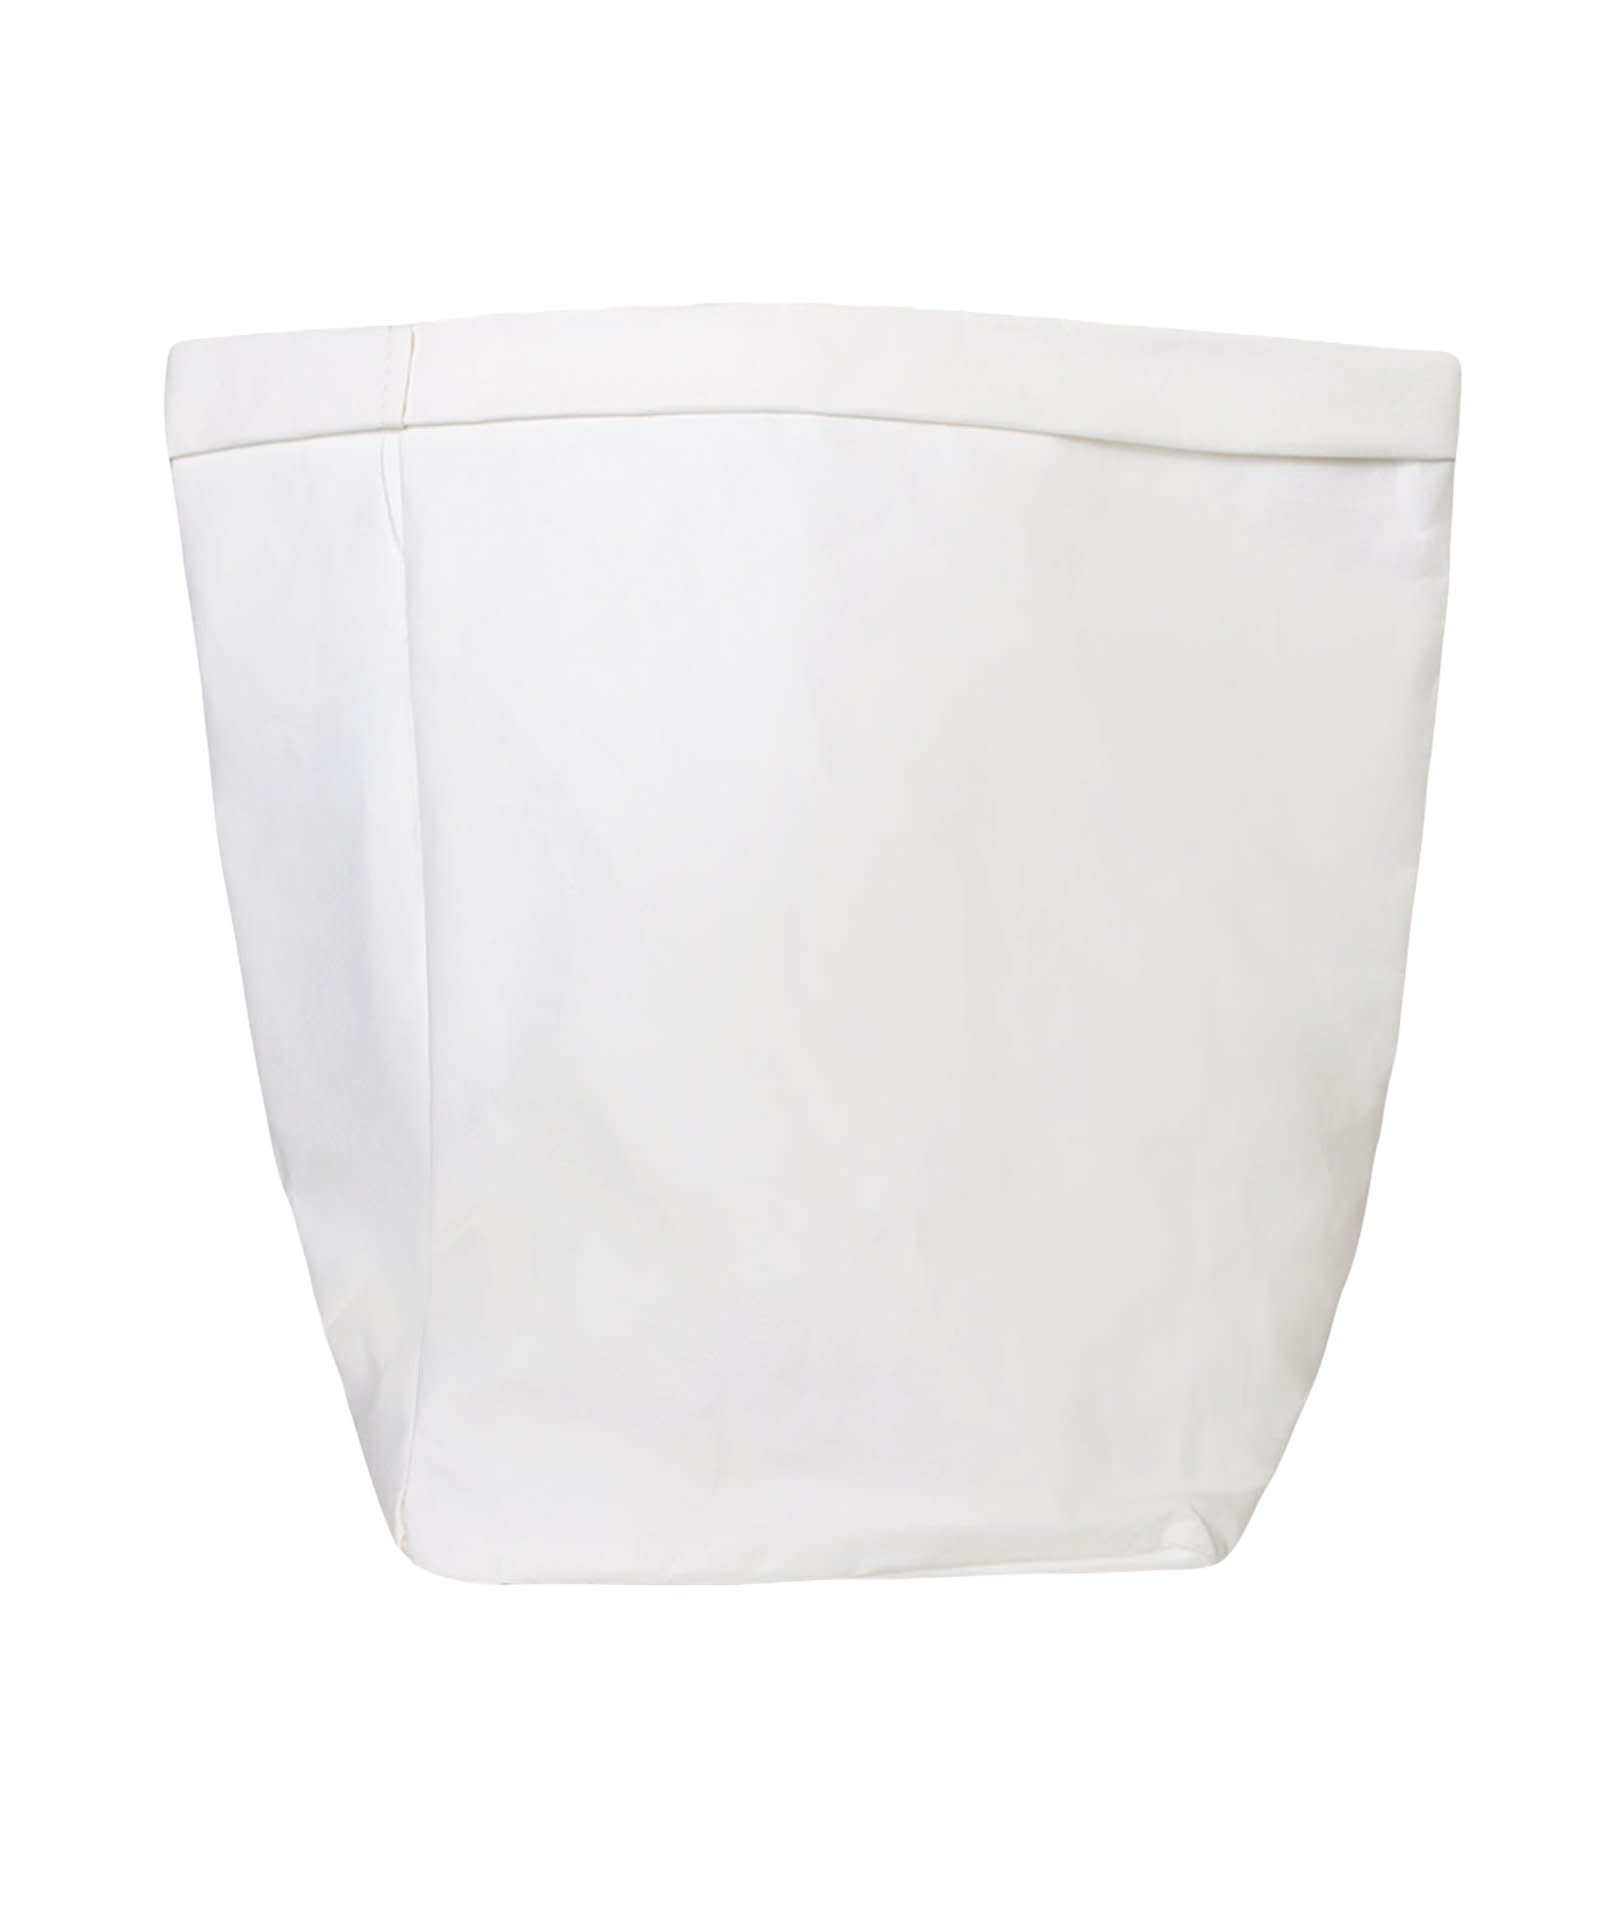 Zak the laundry bag XL white-2